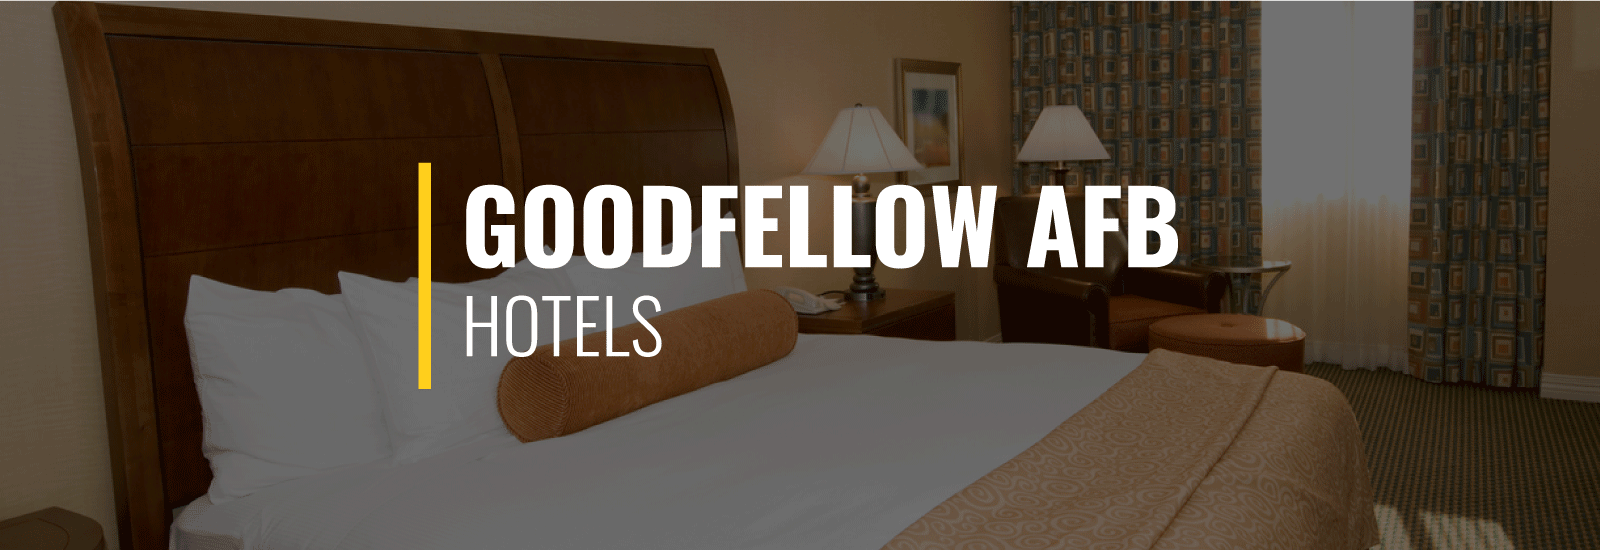 Goodfellow AFB Hotels